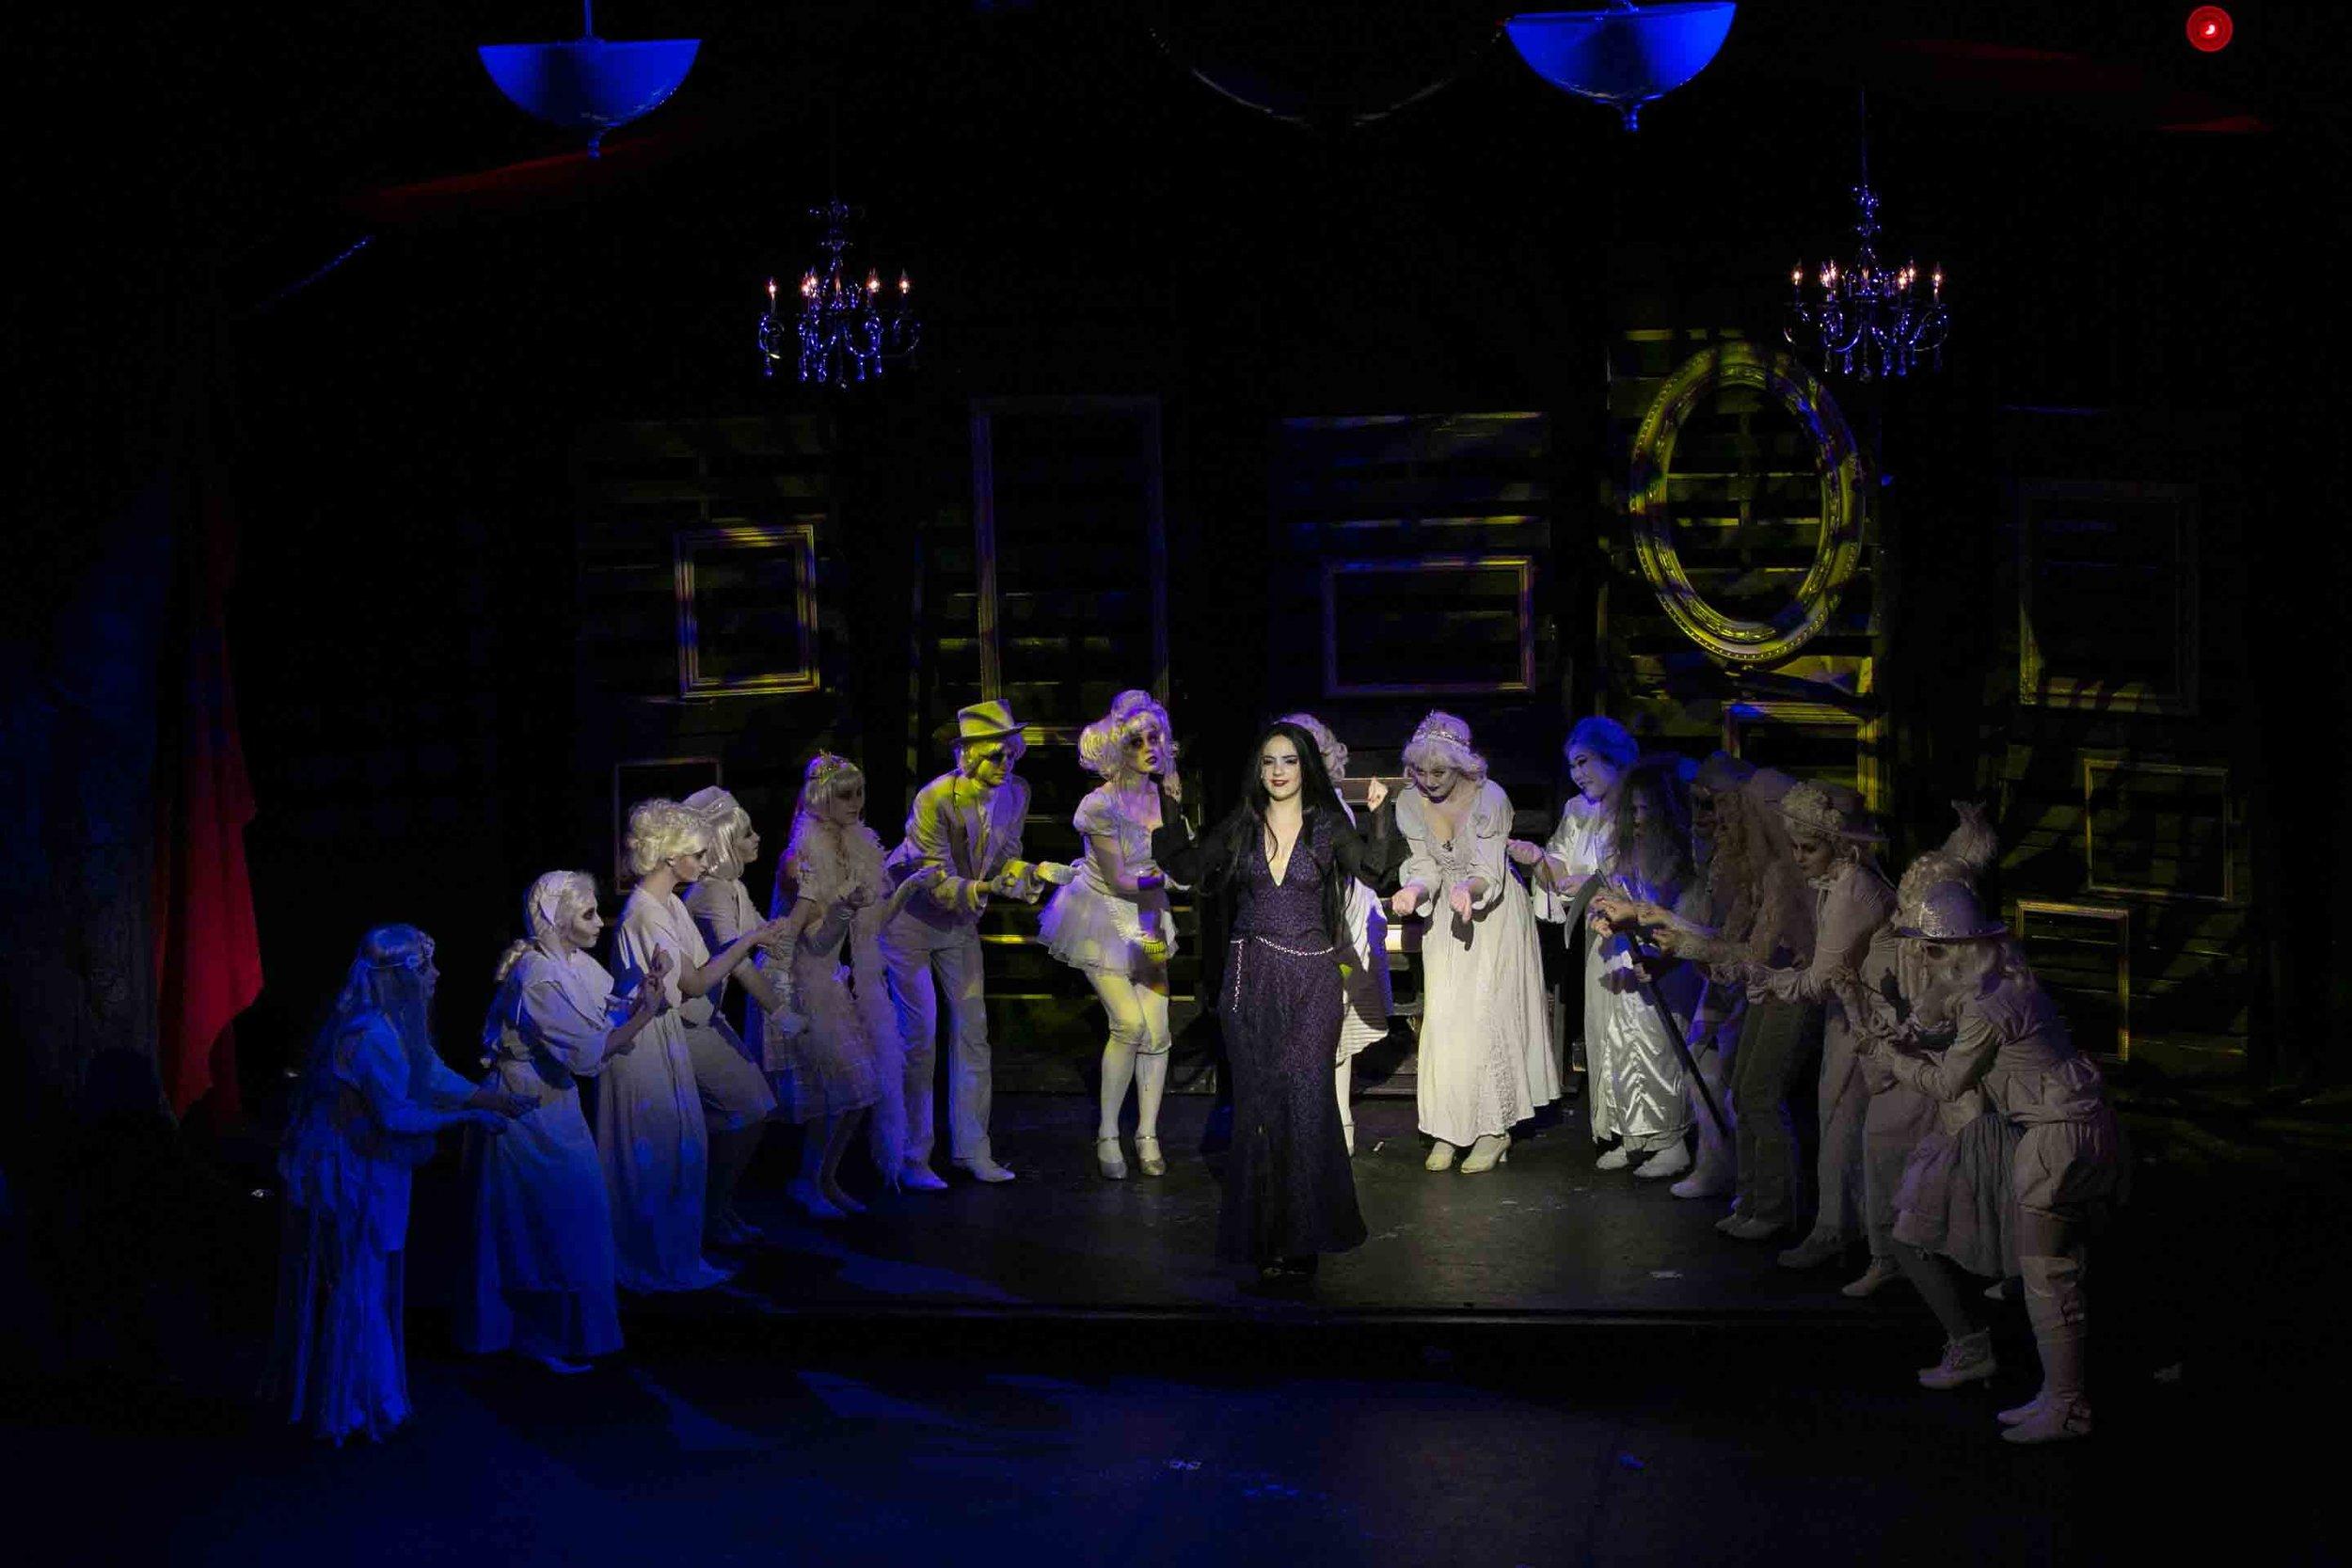 6-19-16 Addams Family Creepy Cast 0226.jpg